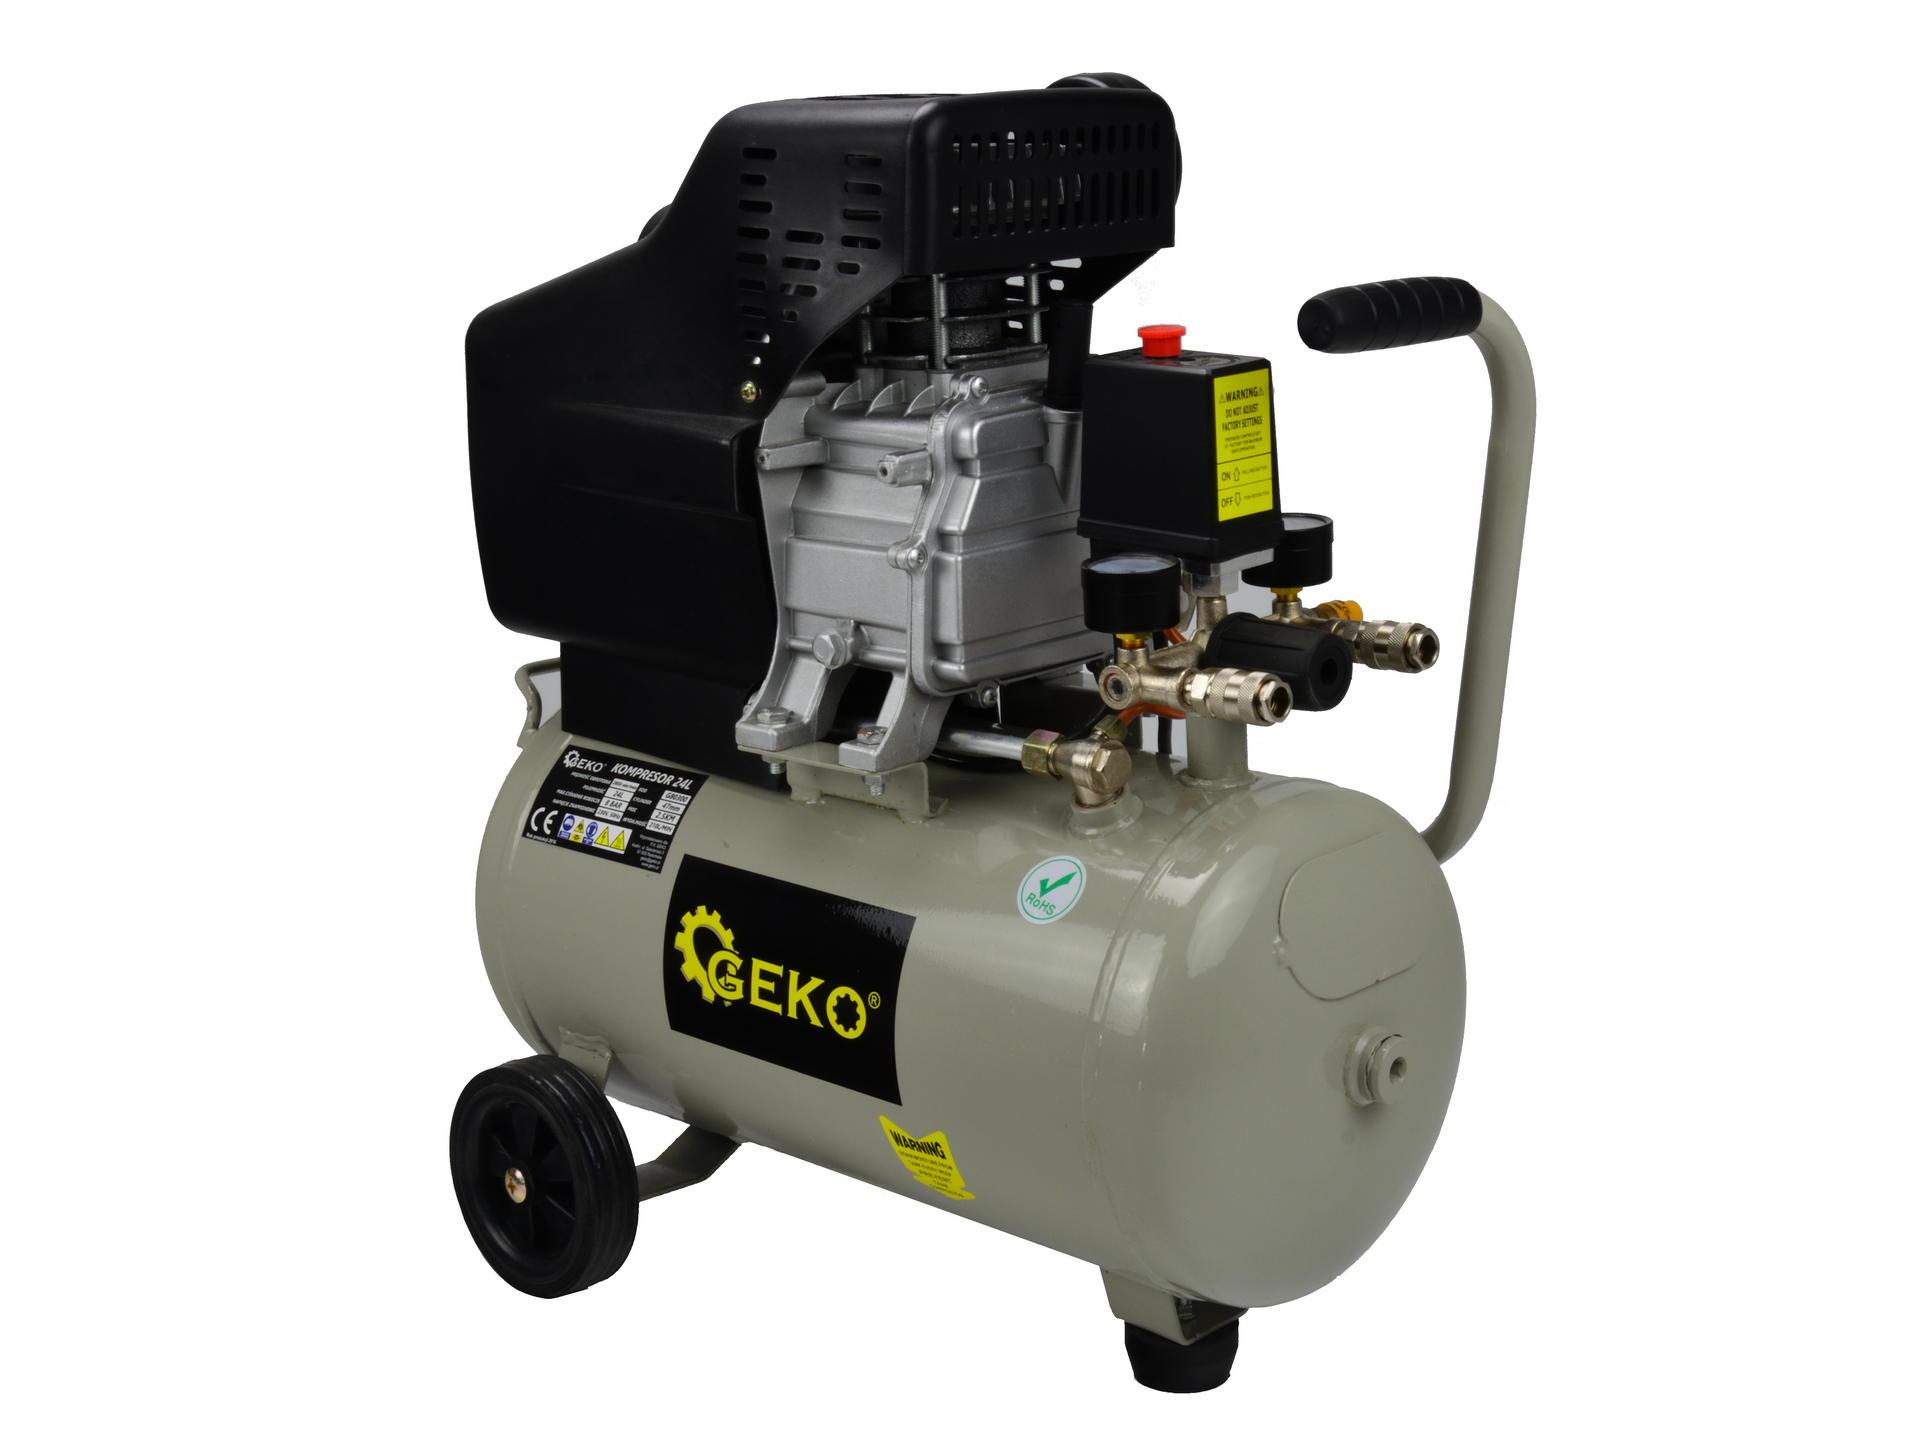 Gaisa kompresors 230V / 1,5kW 210l/min 50L GEKO